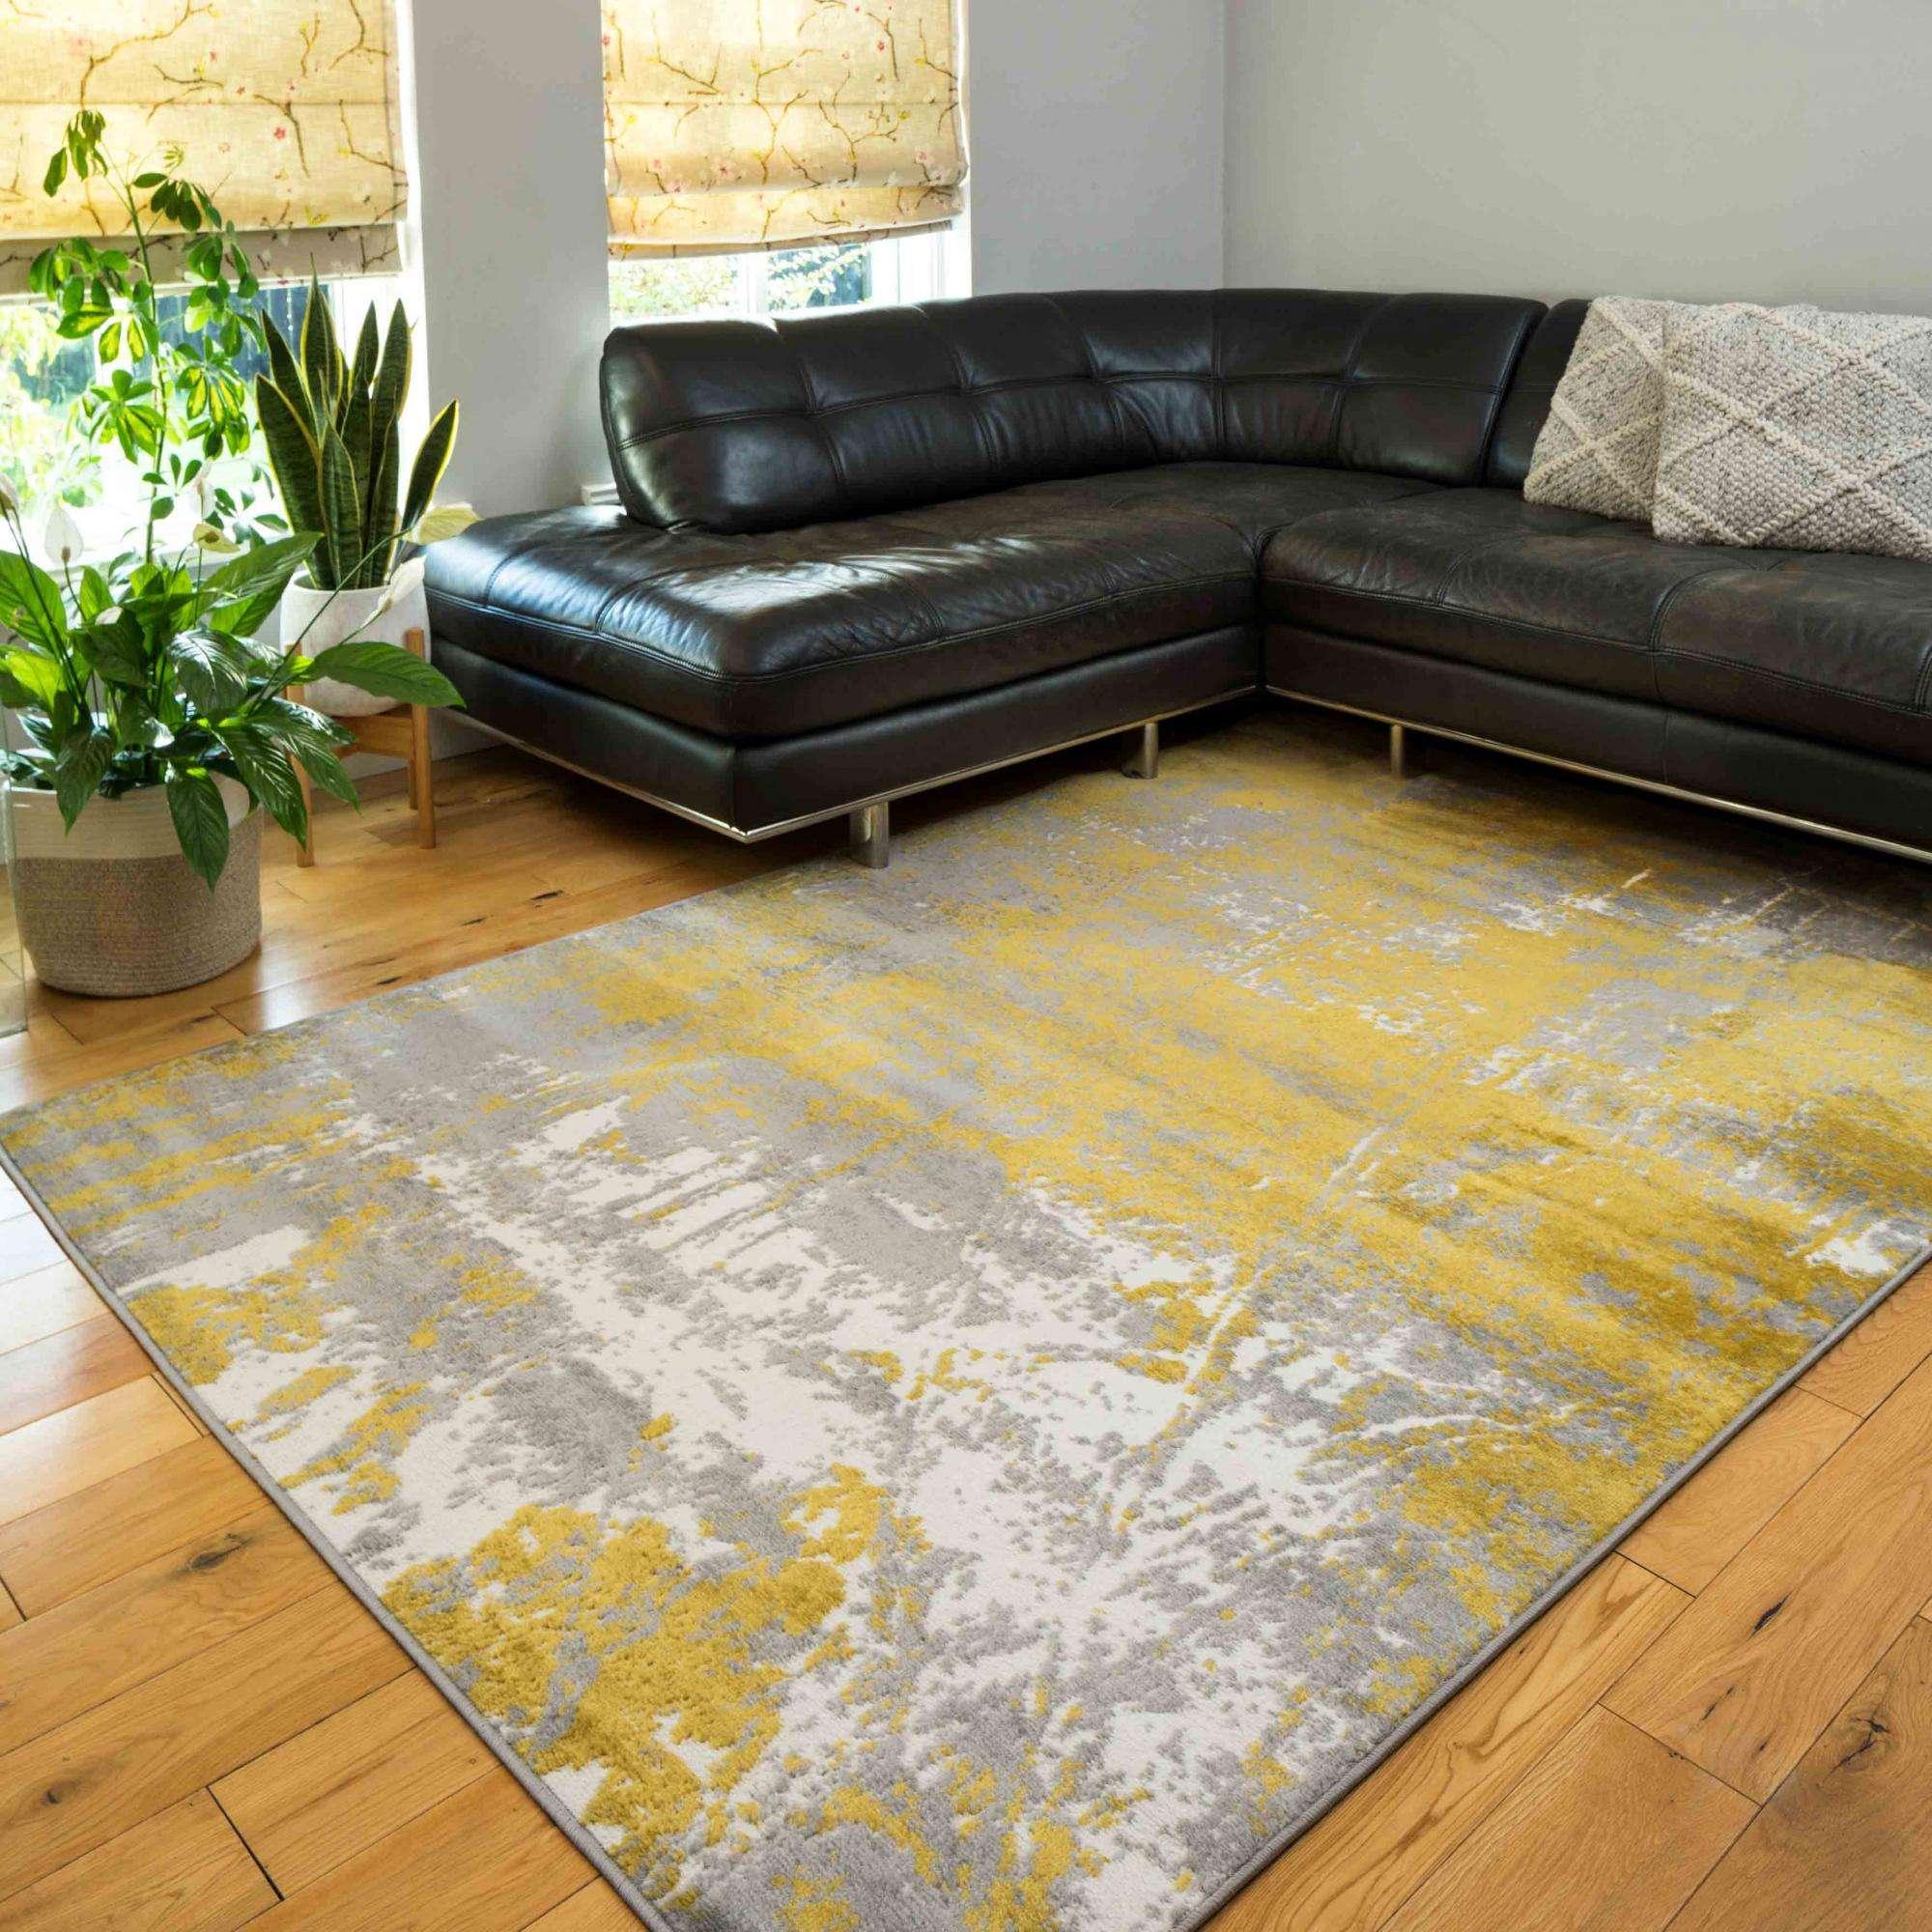 Living room Rugs | Budget Flooring, Inc.